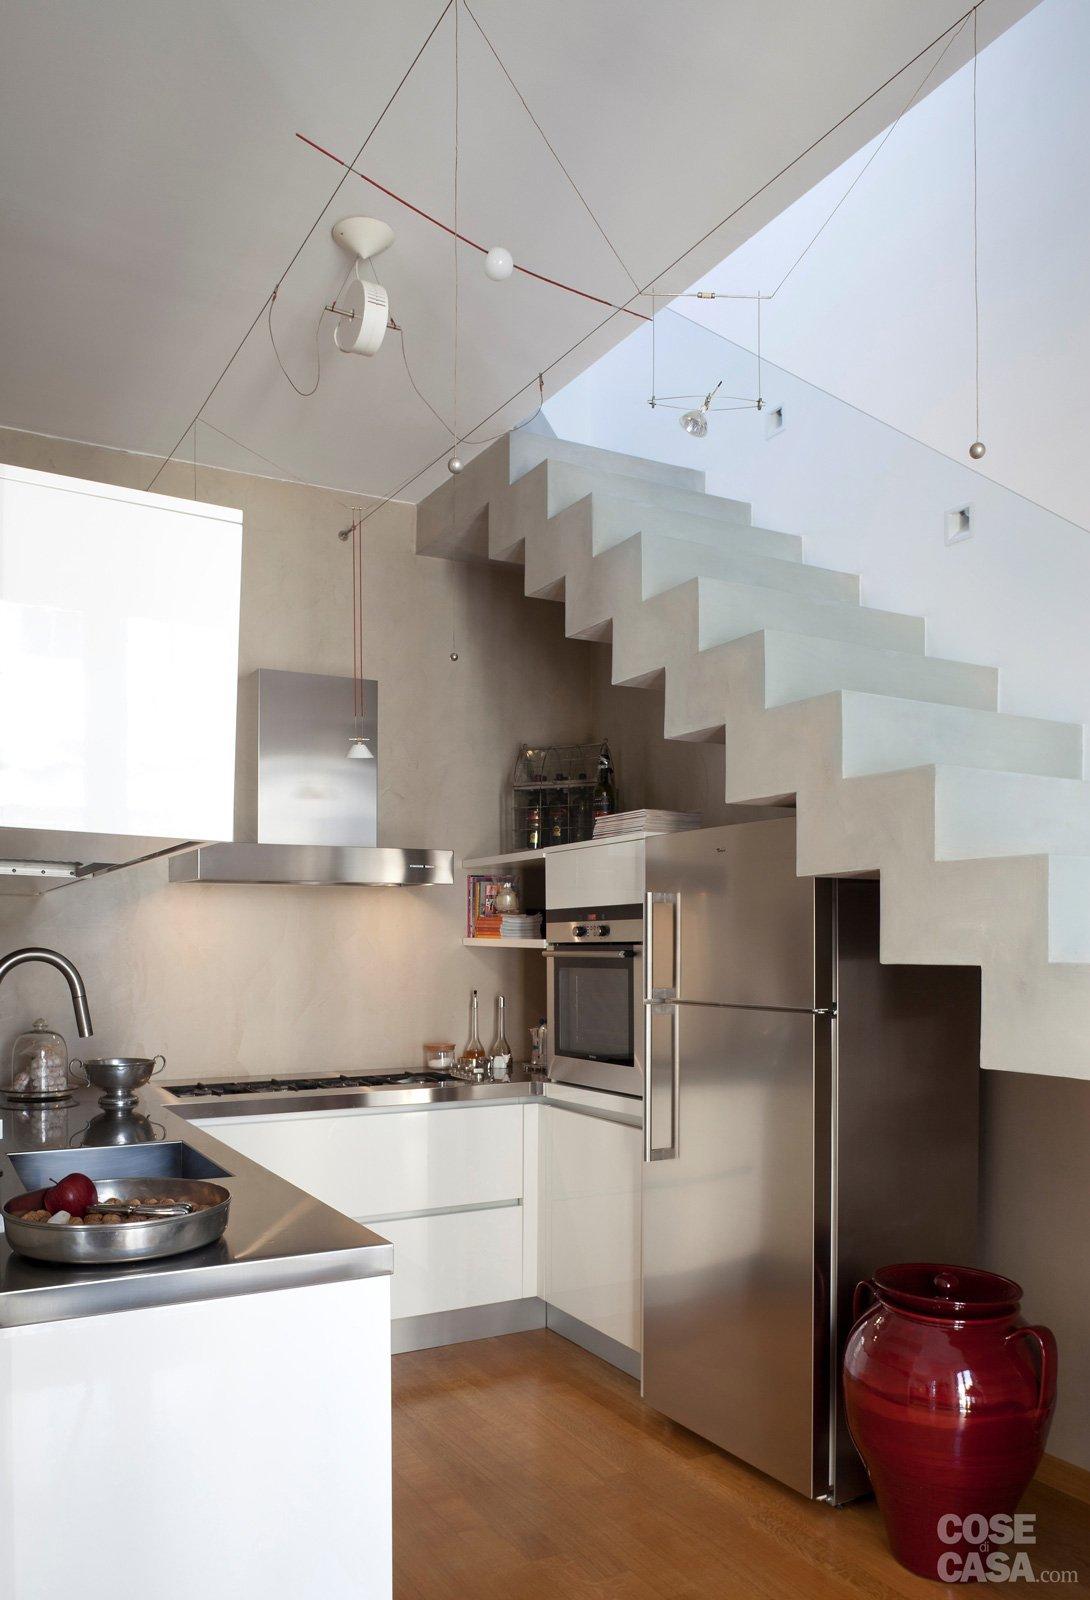 Una casa da copiare 10 idee tra spunti d 39 arredo e decor - Immagini di tende per cucina ...